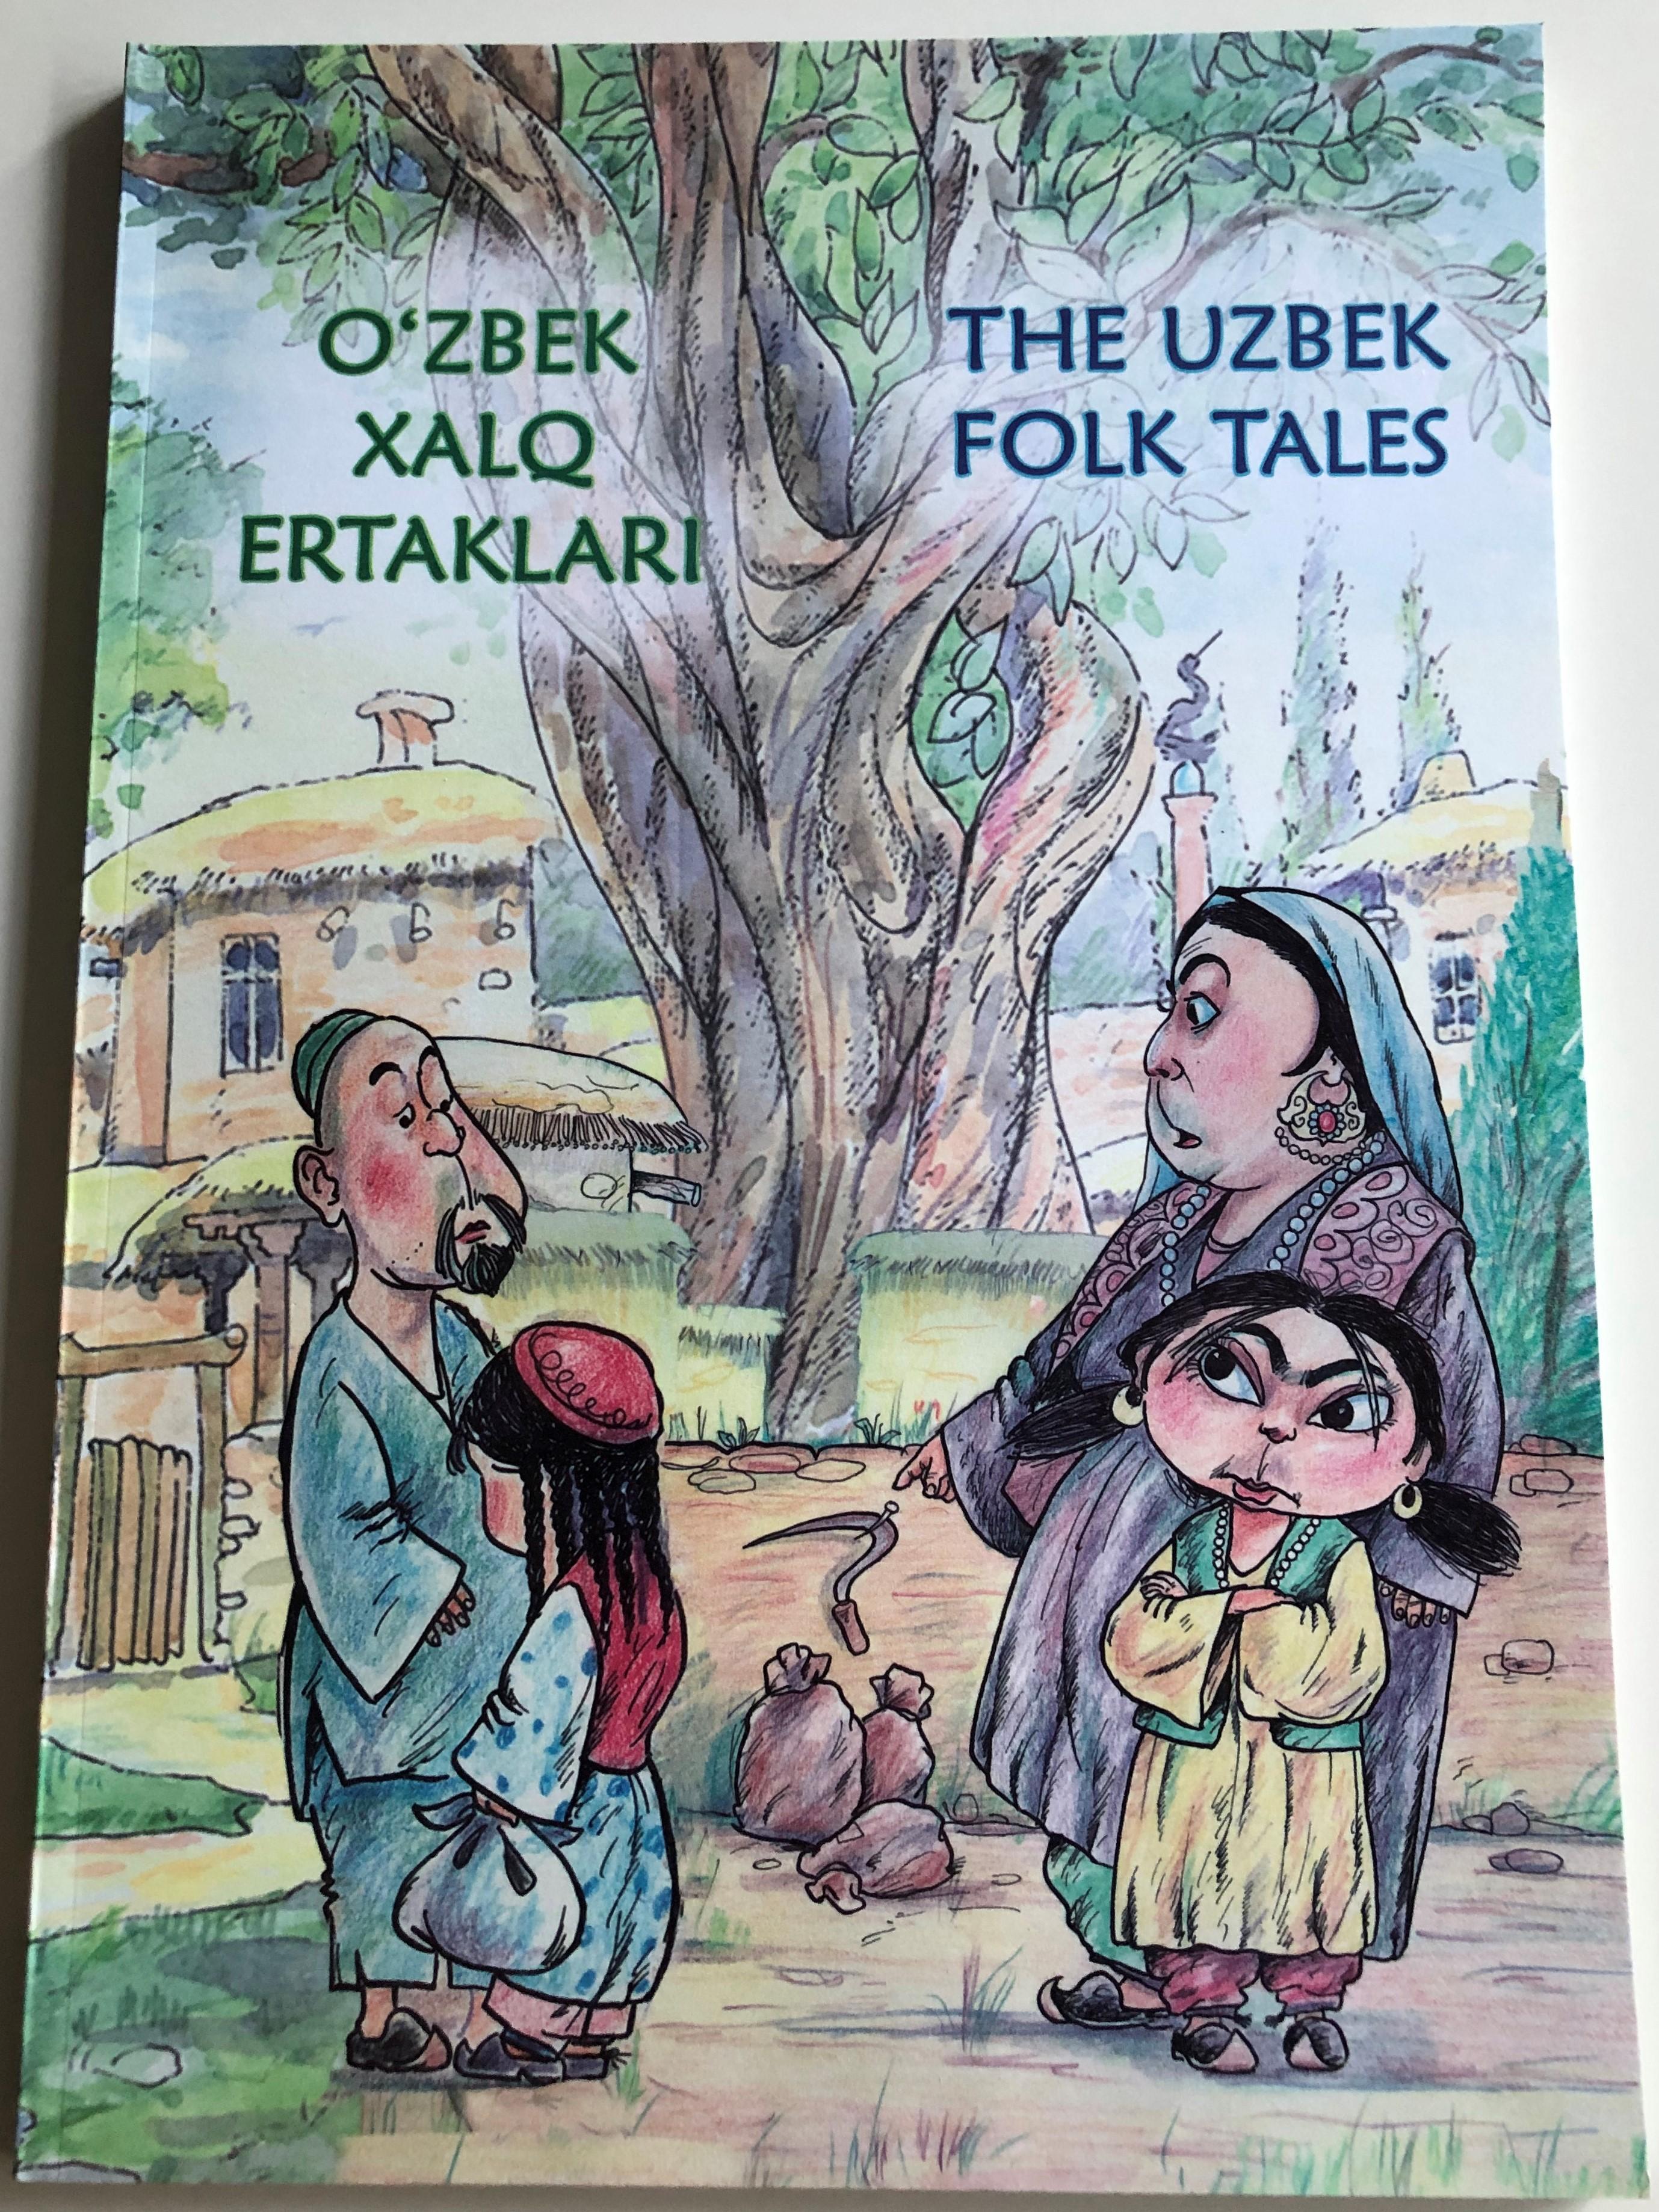 the-uzbek-folk-tales-o-zbek-xalq-ertaklari-by-husan-sodikov-uzbek-english-bilingual-edition-art-flex-paperback-2017-great-gift-for-children-1-.jpg